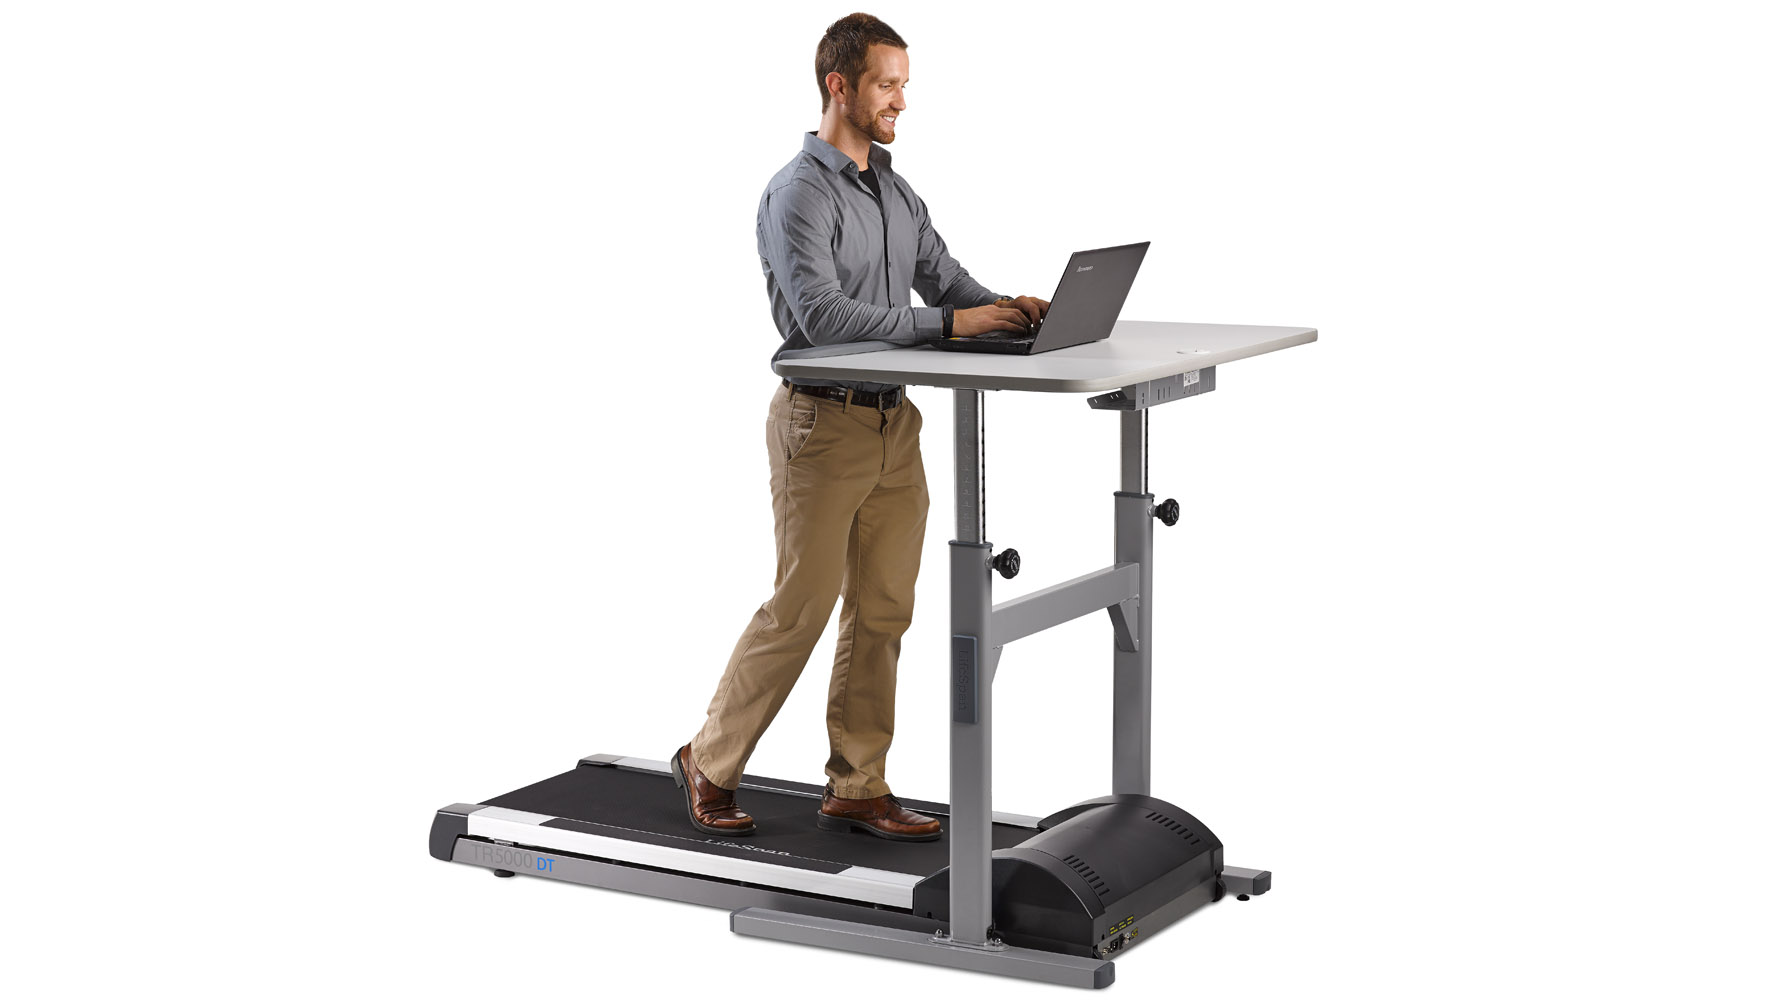 Modern fice LifeSpan High Use Treadmill with Manual Desk